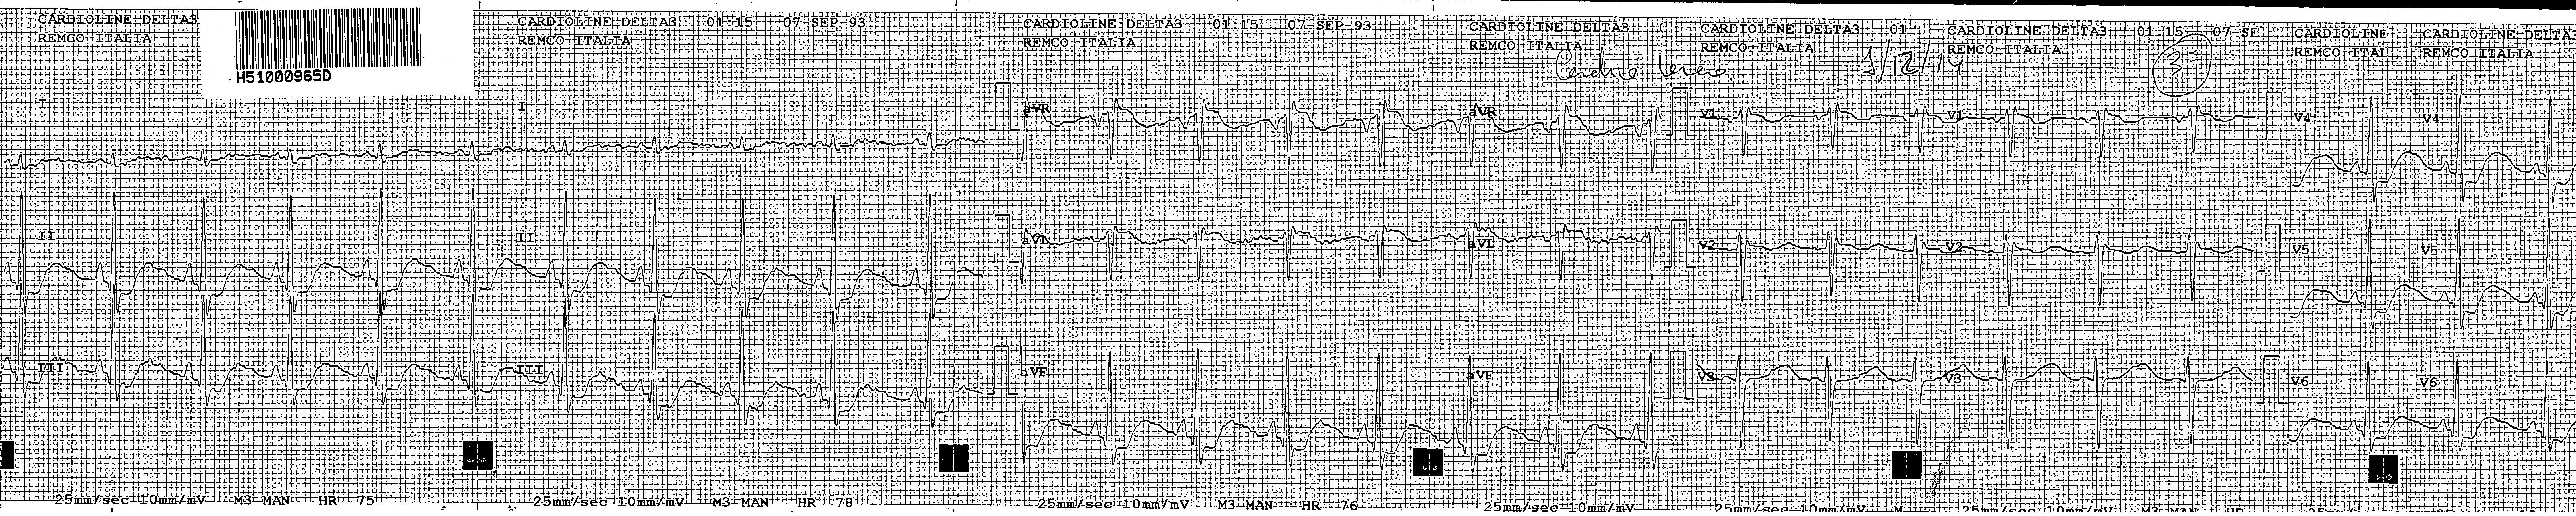 Imagen 1: ECG: RS a 70 lpm, eje normal. Descenso de ST en II, III,  aVF , V4-V6. Ascenso en aVR.